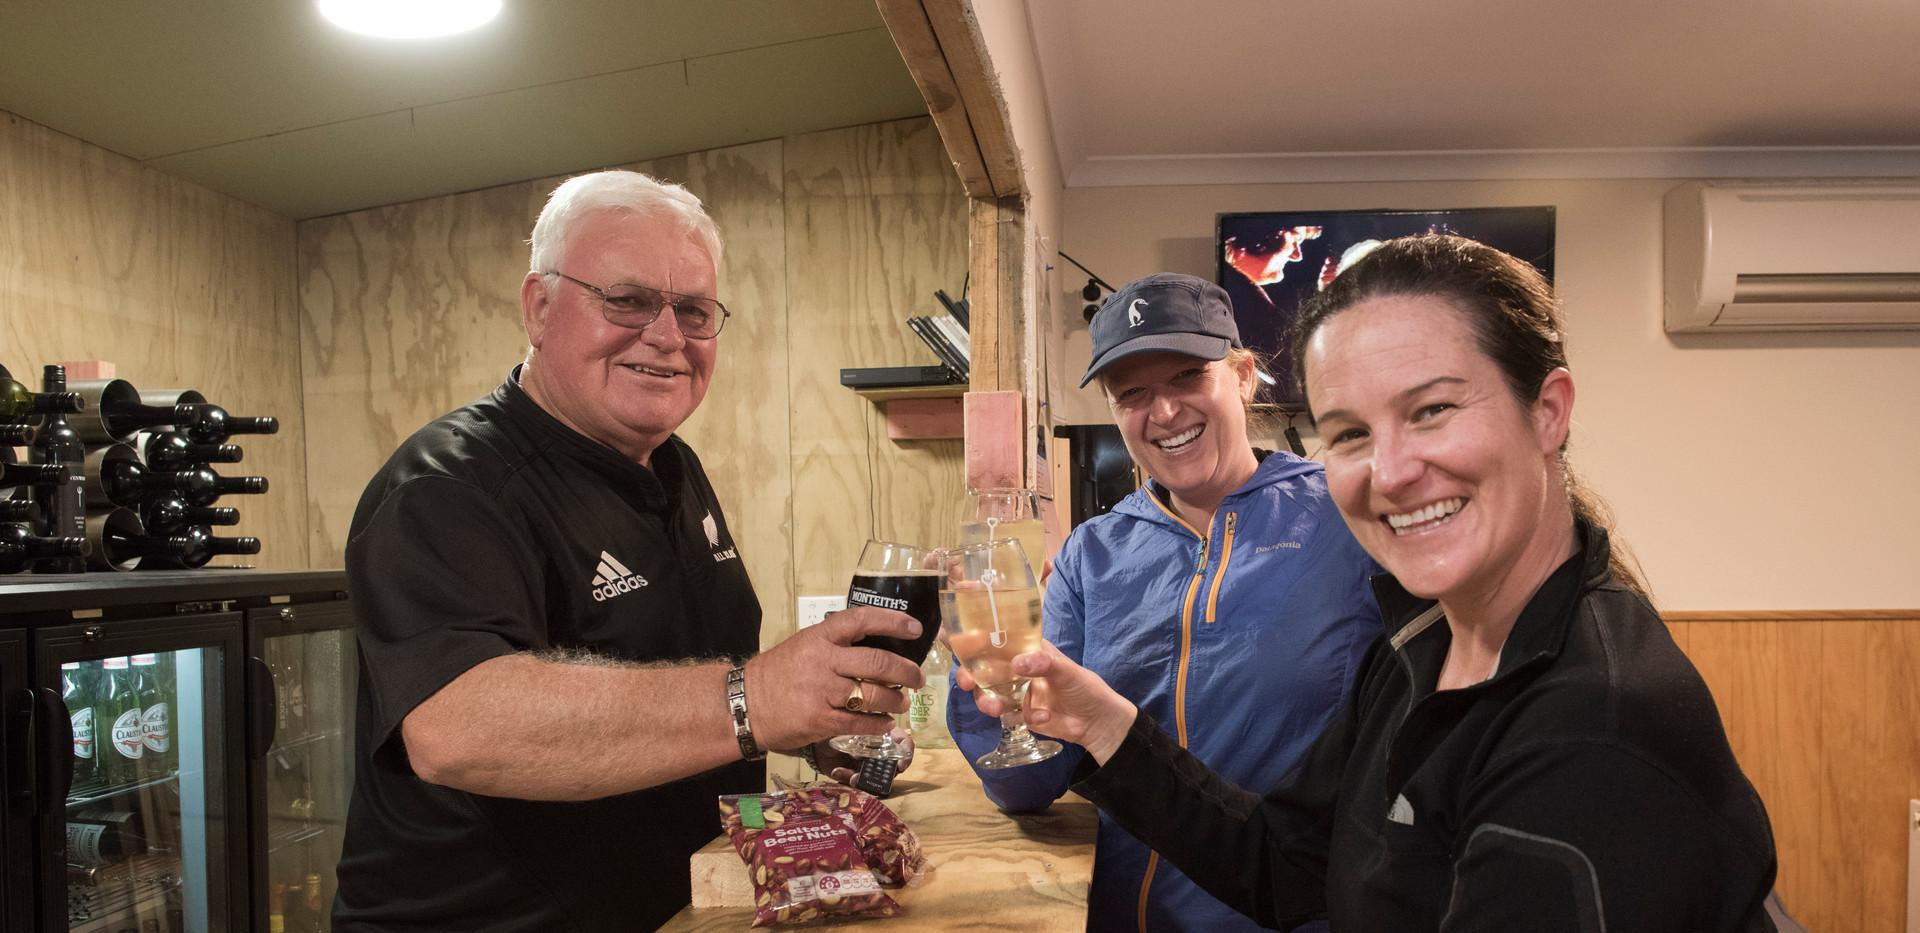 Dutchy serves drinks at the Adventure Lodge bar